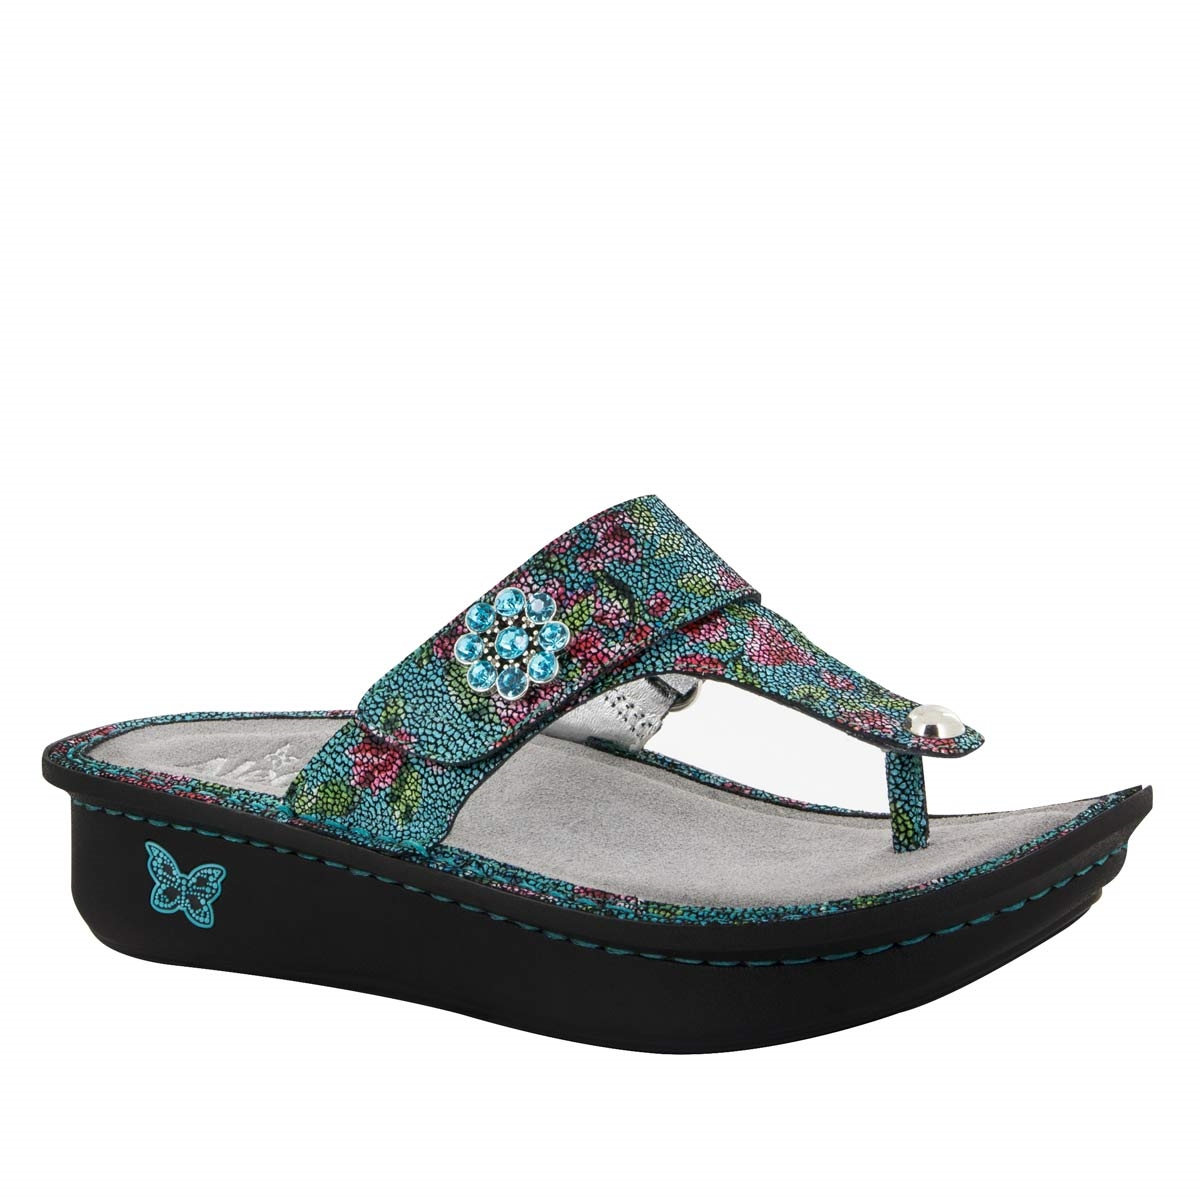 278bf5ca767e2b Carina Aqua Flora Sandal - Alegria Shoes